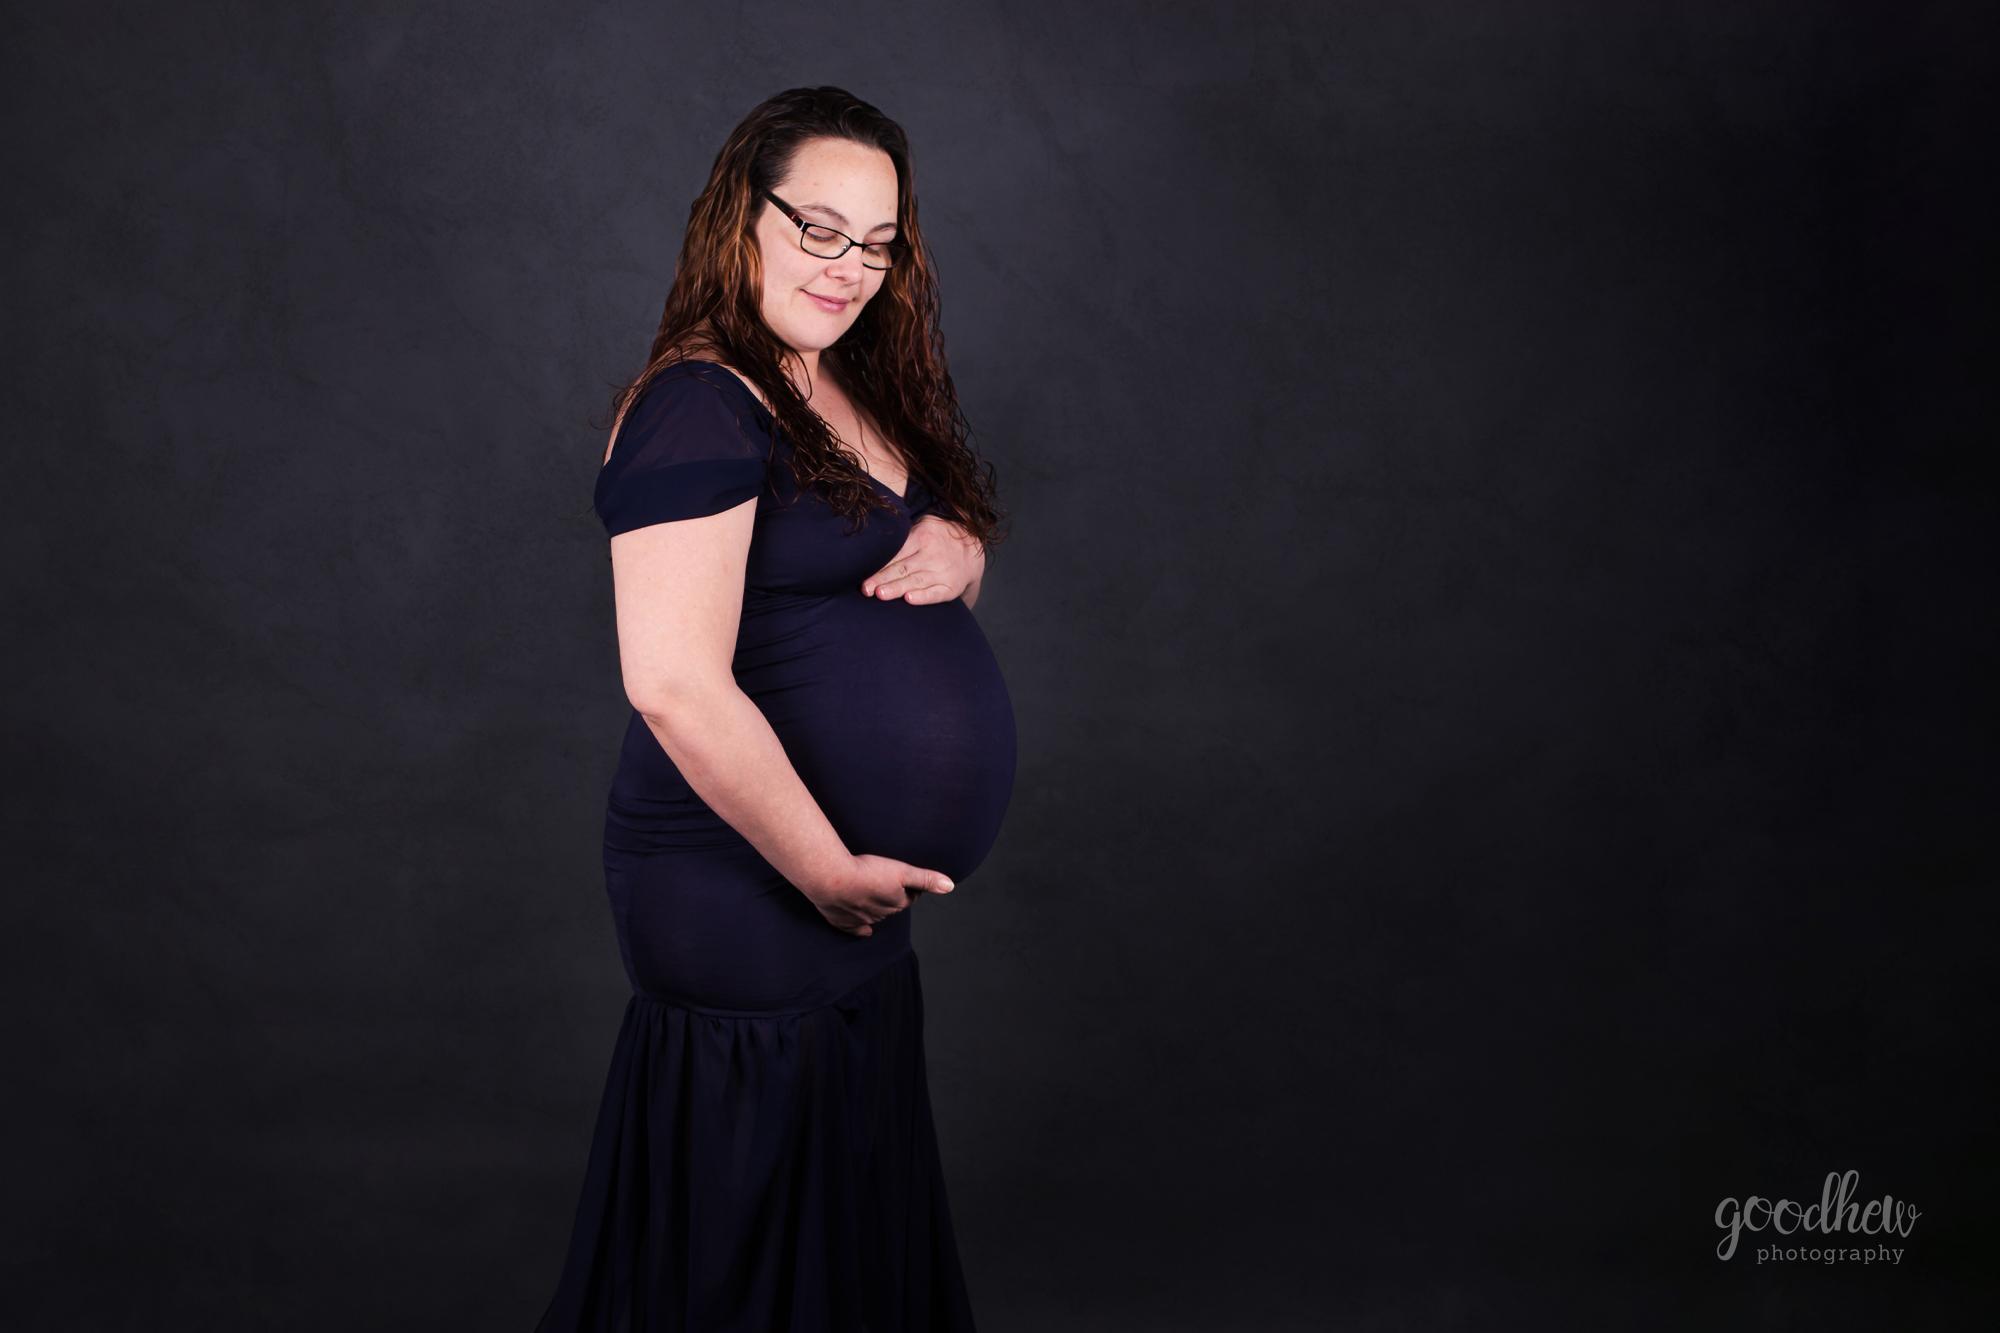 jxn-mi-studio-maternity-portraits